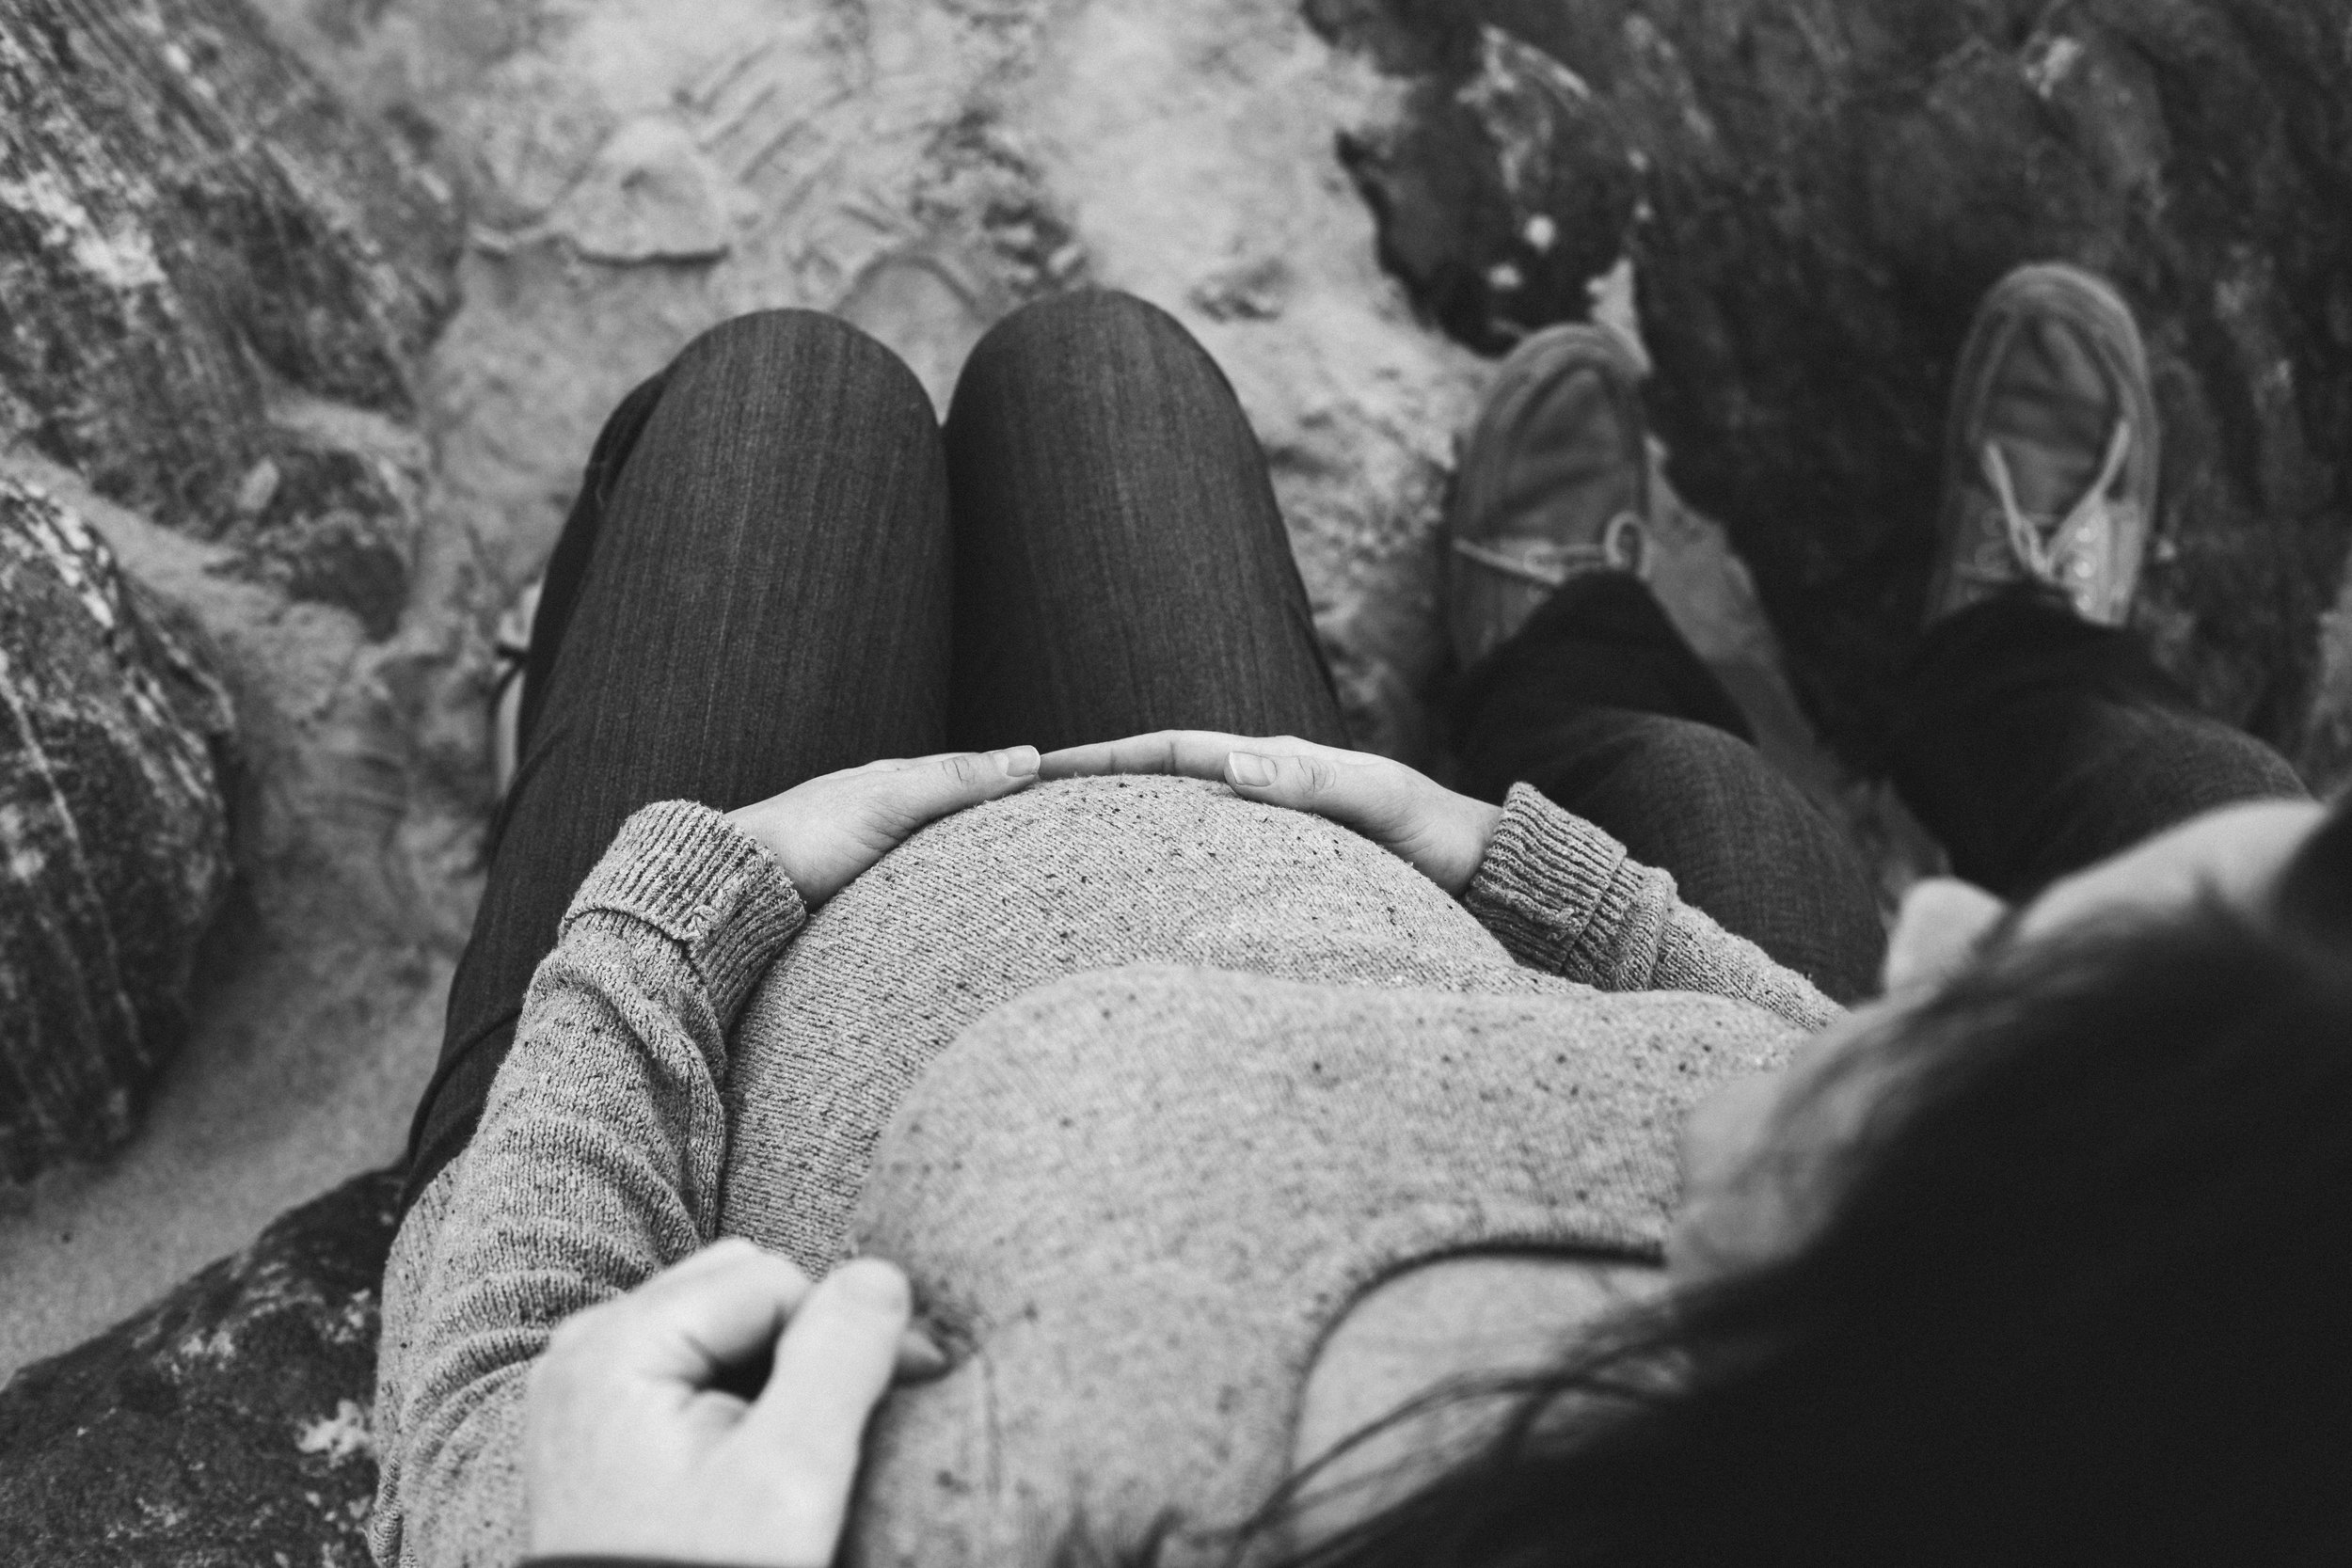 baby bump, maternity, motherhood, birth, maternity photography